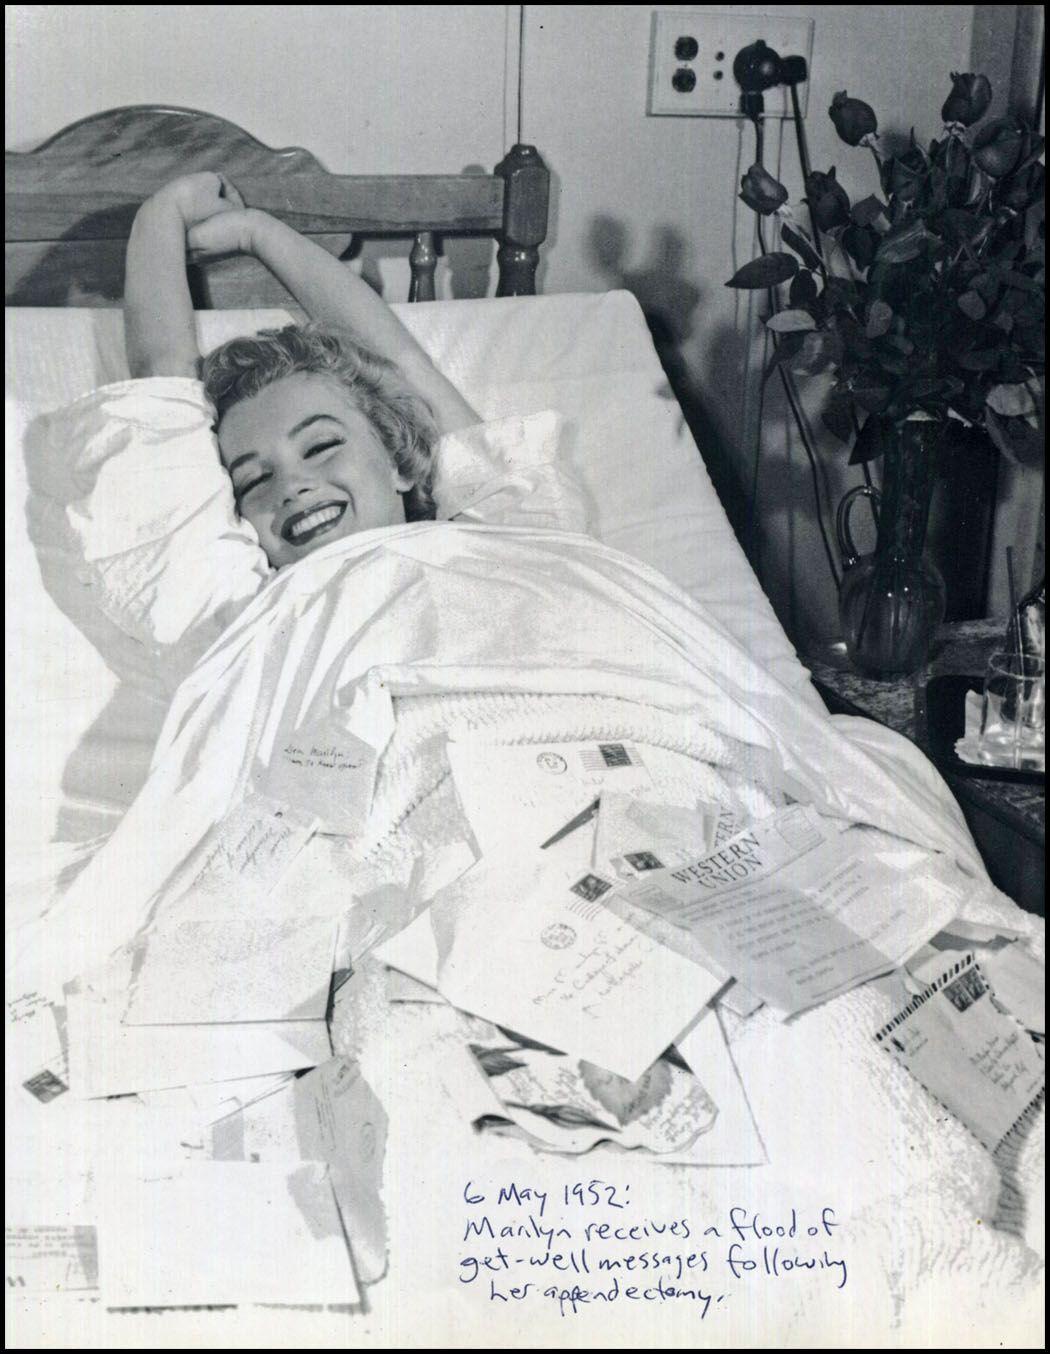 MarilynMonroe_May6,1952_100.jpg (1050×1354)